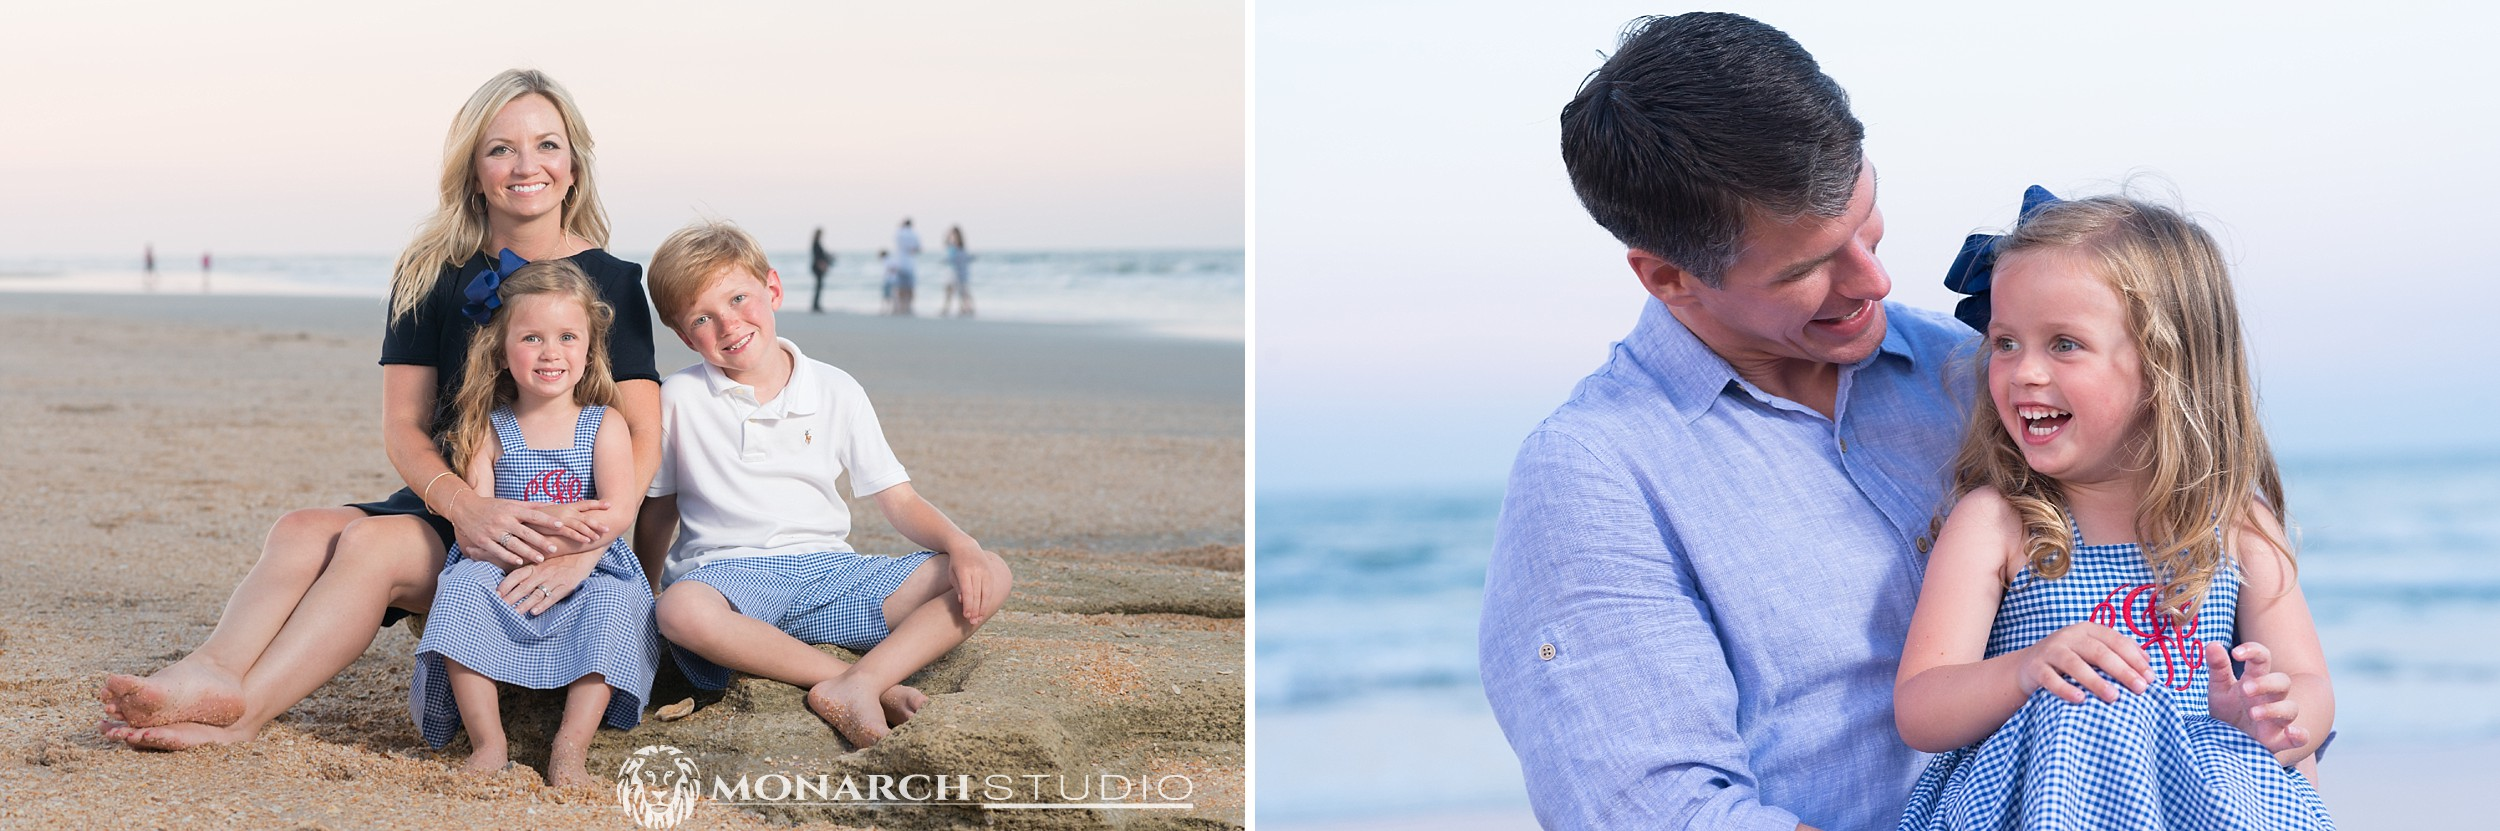 St-Augustine-Beach-Family-Portrait-Photographer_0026.jpg